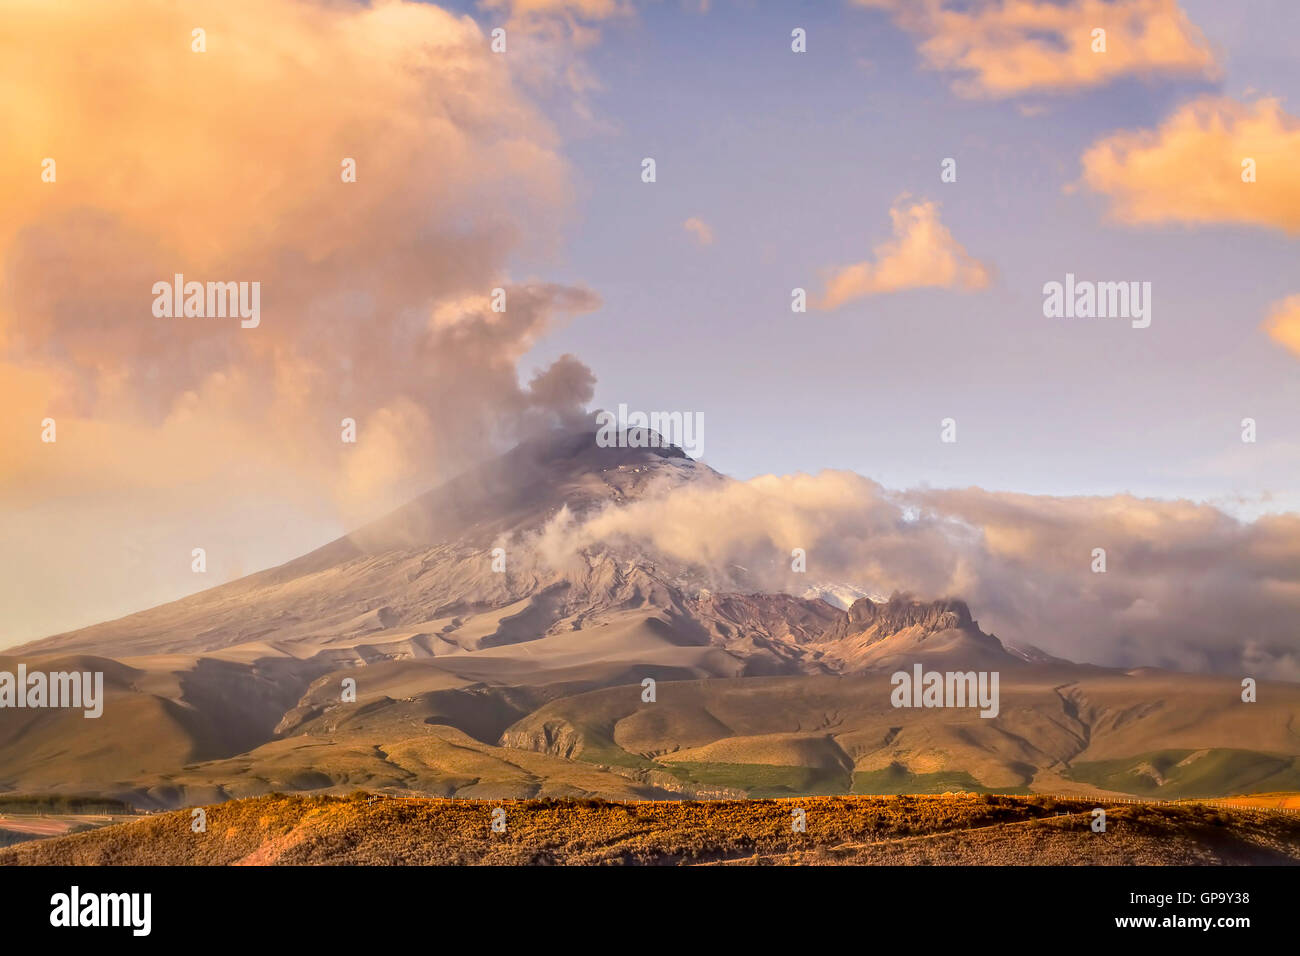 Cotopaxi Volcano Erupting In Ecuador, South America - Stock Image